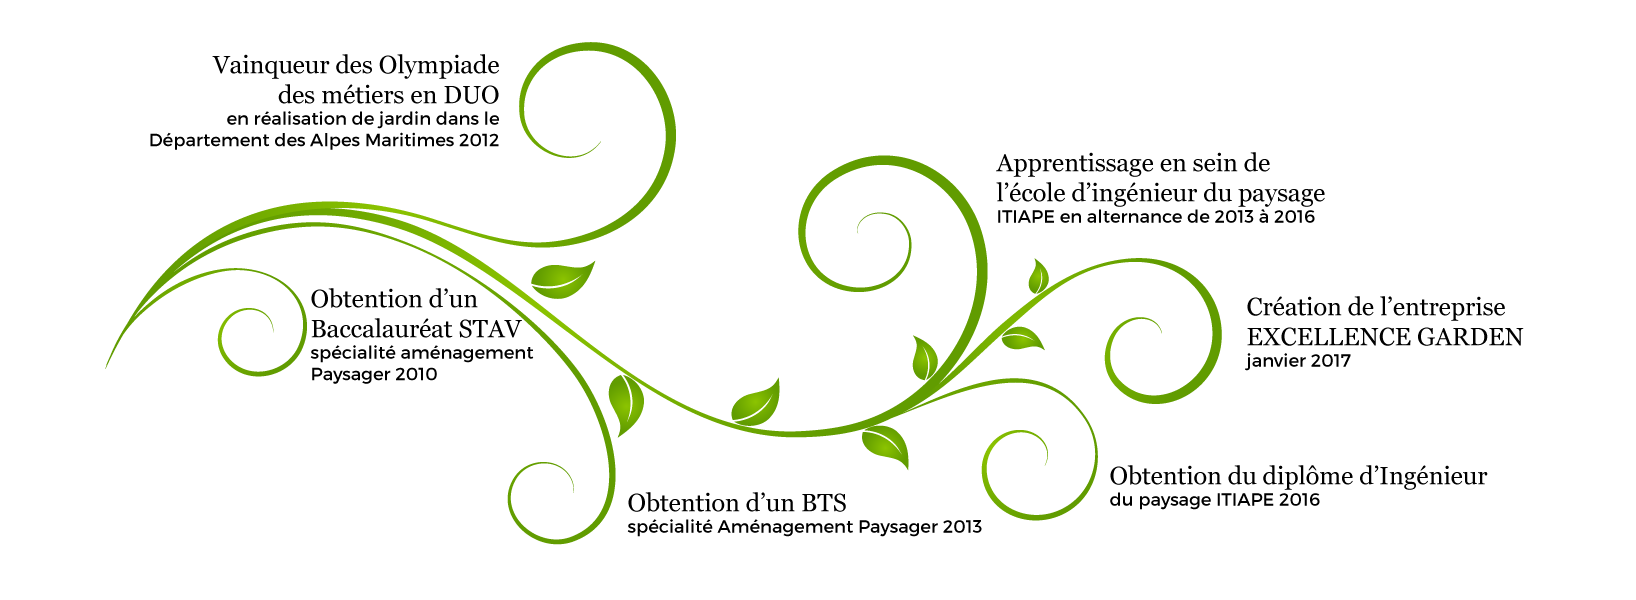 Excellence garden - Entreprise de conception d'espace vert crée en 2017